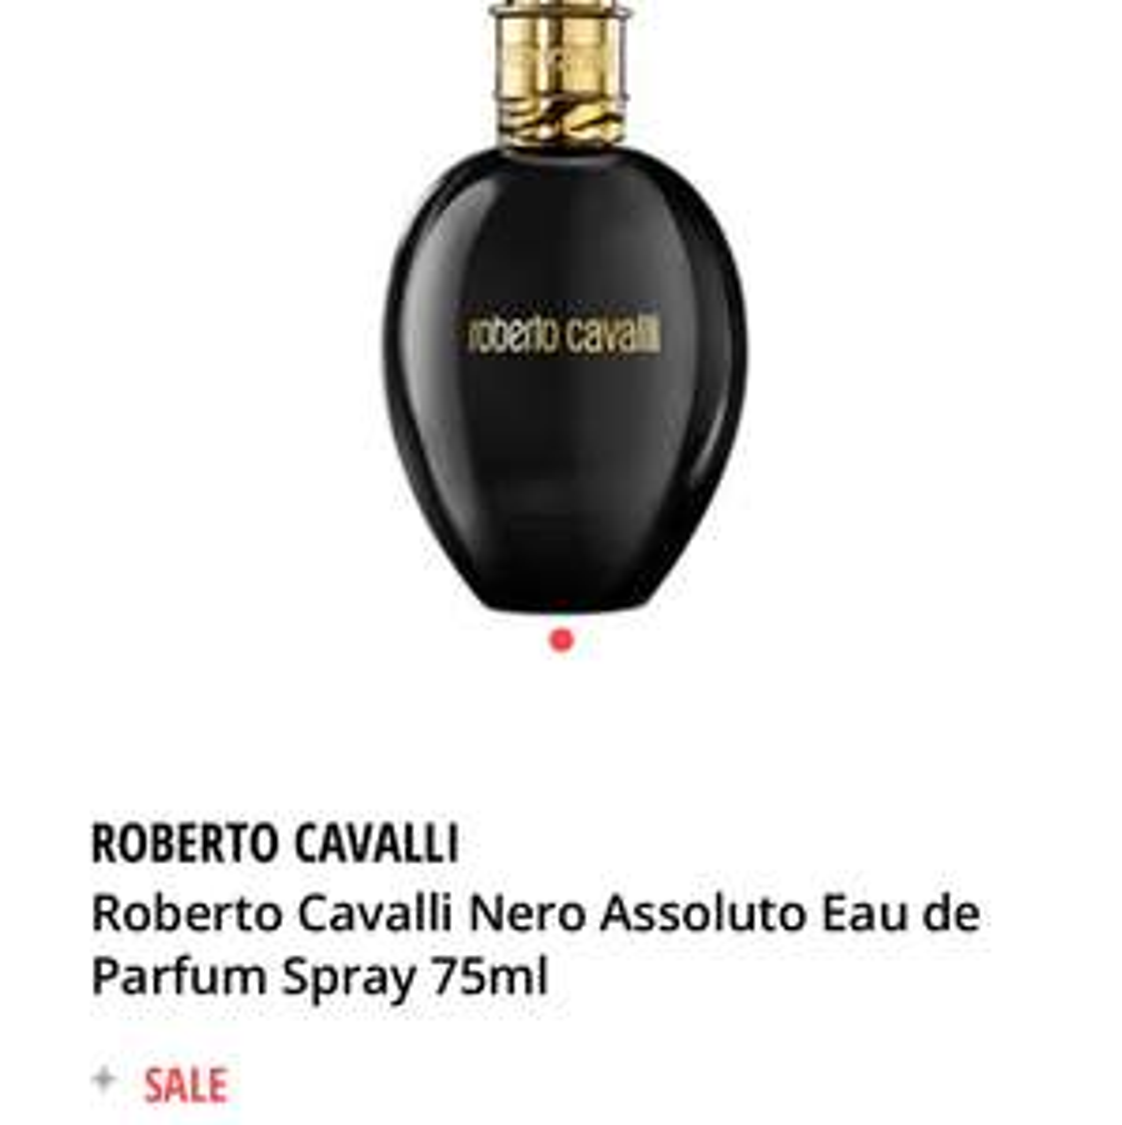 ROBERTO CAVALLI : Roberto Cavalli Nero Assoluto Eau de Parfum Spray 75ml £22.95 @ Fragrance Direct.